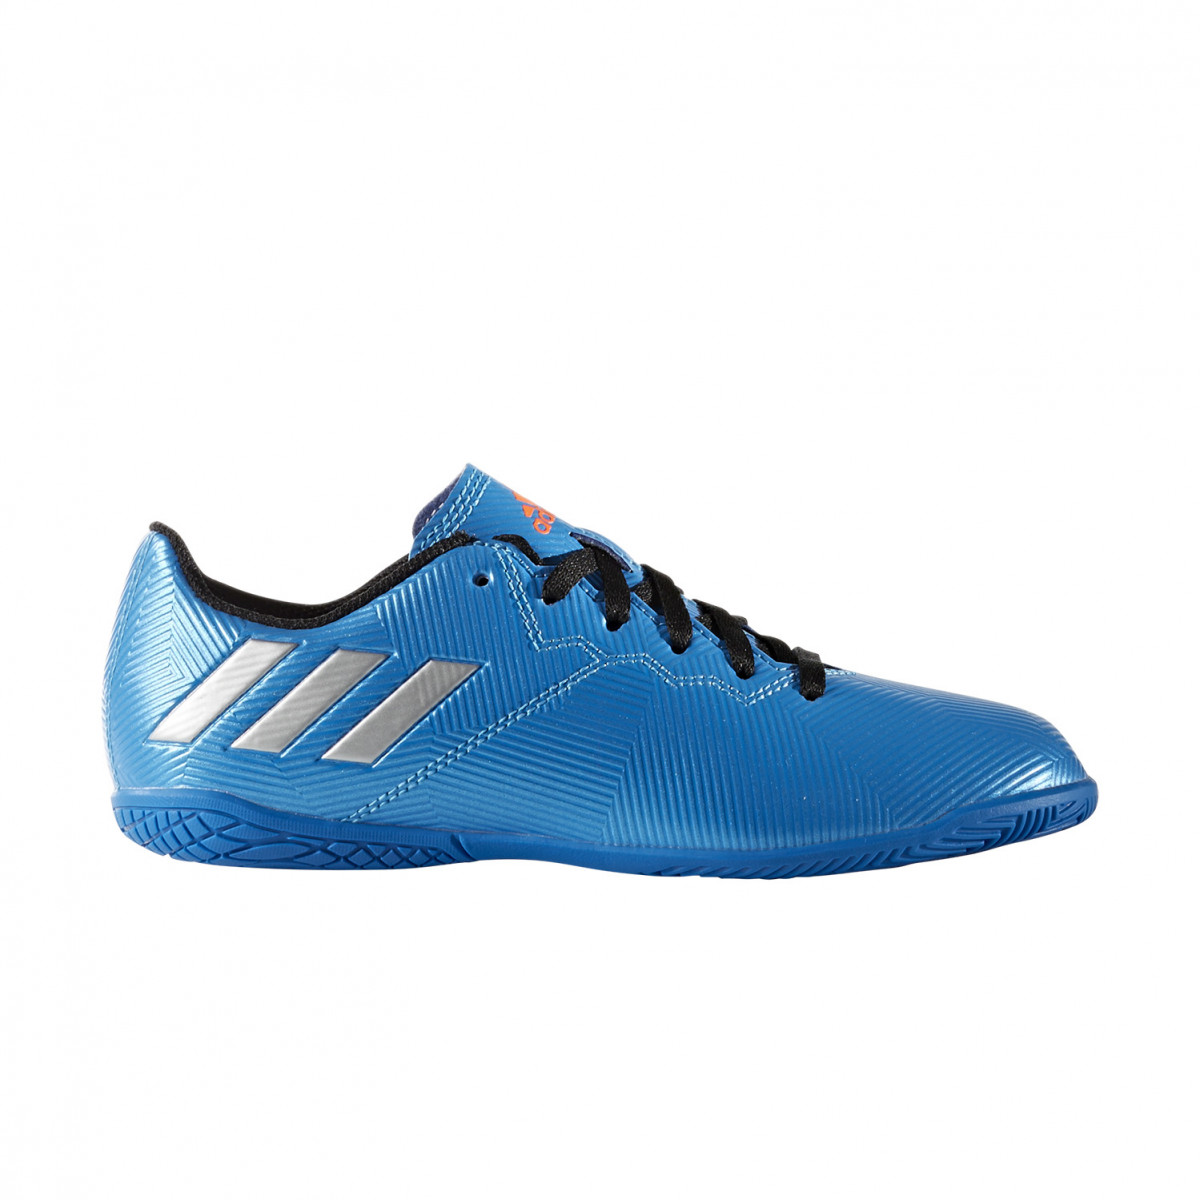 Botines Adidas Messi 16.4